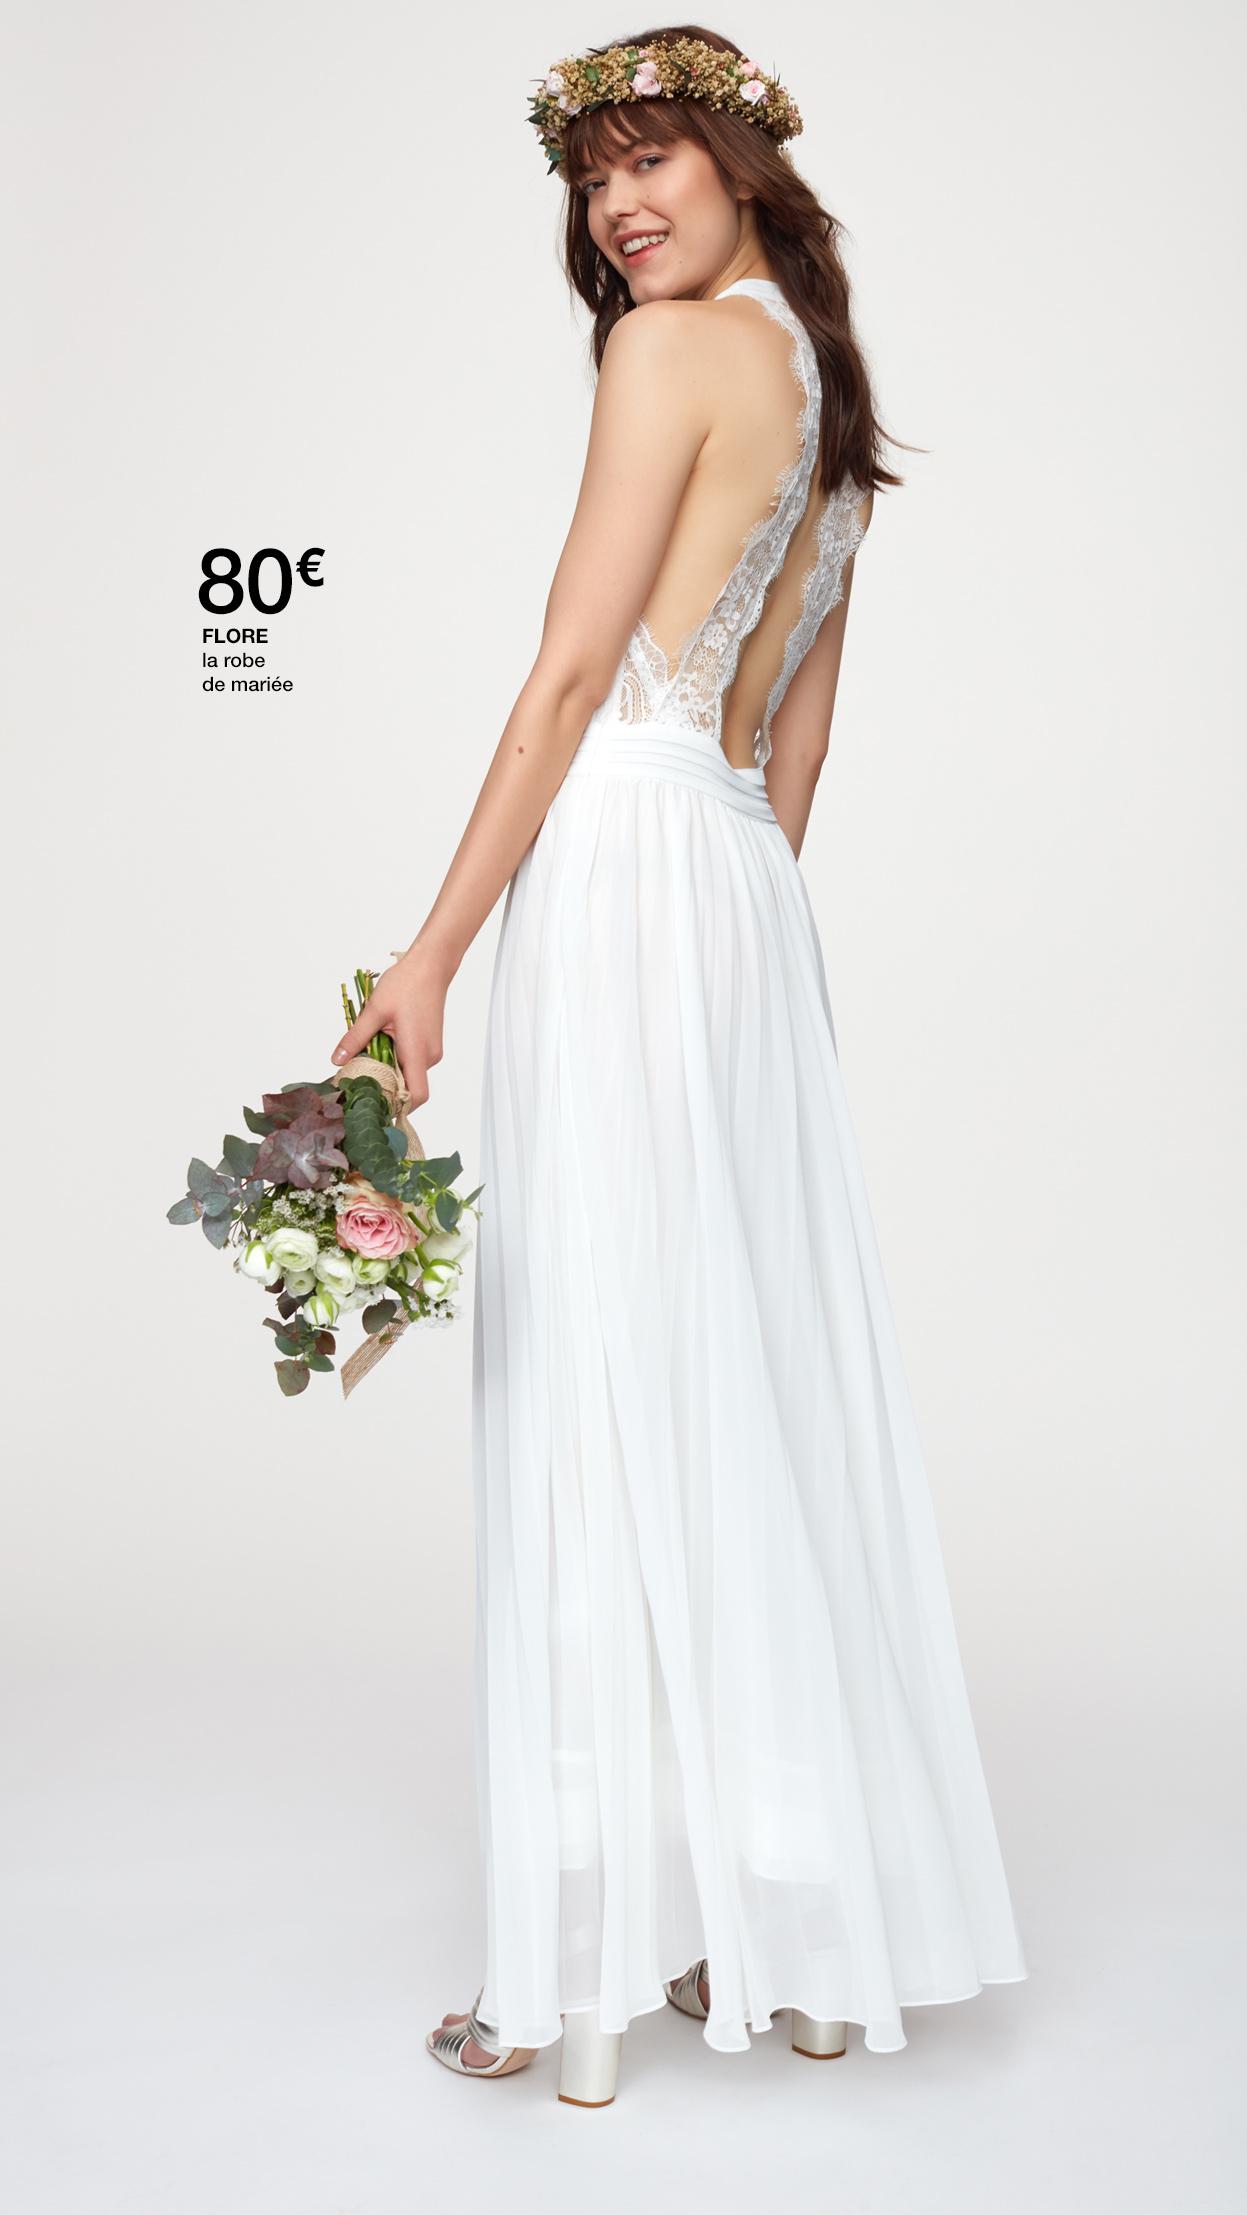 Robes mariage kiabi